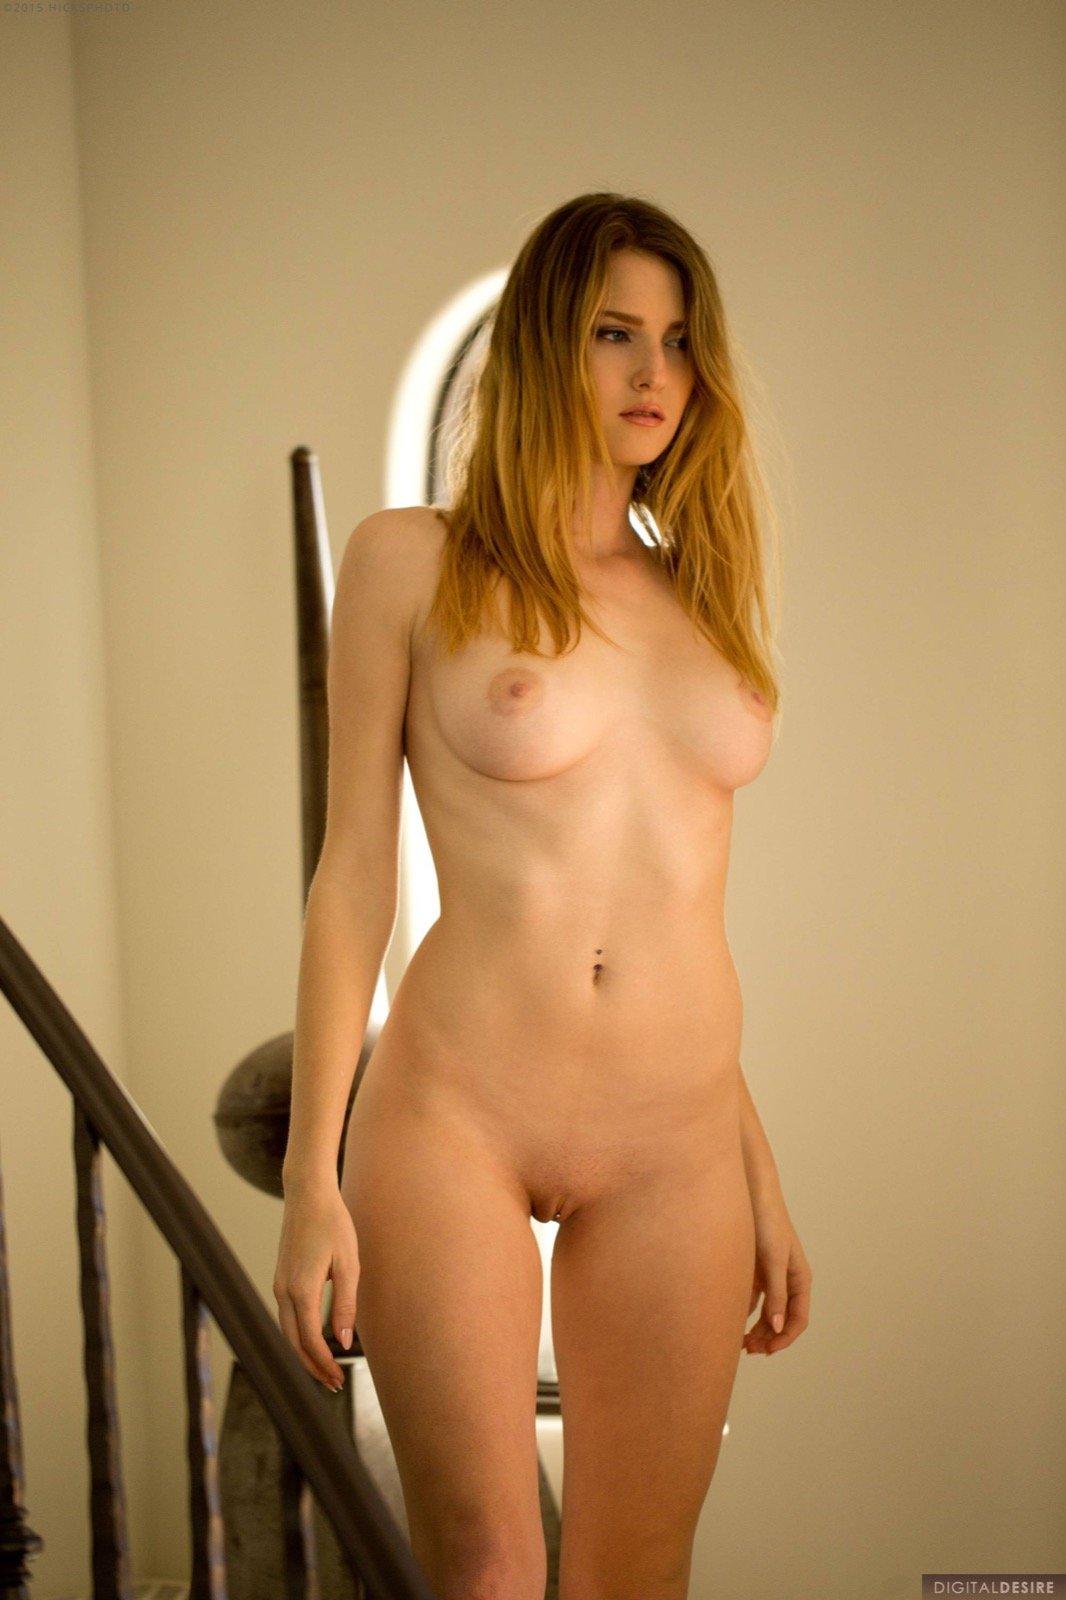 Грудастая красотка сняла майку и трусики на лестнице